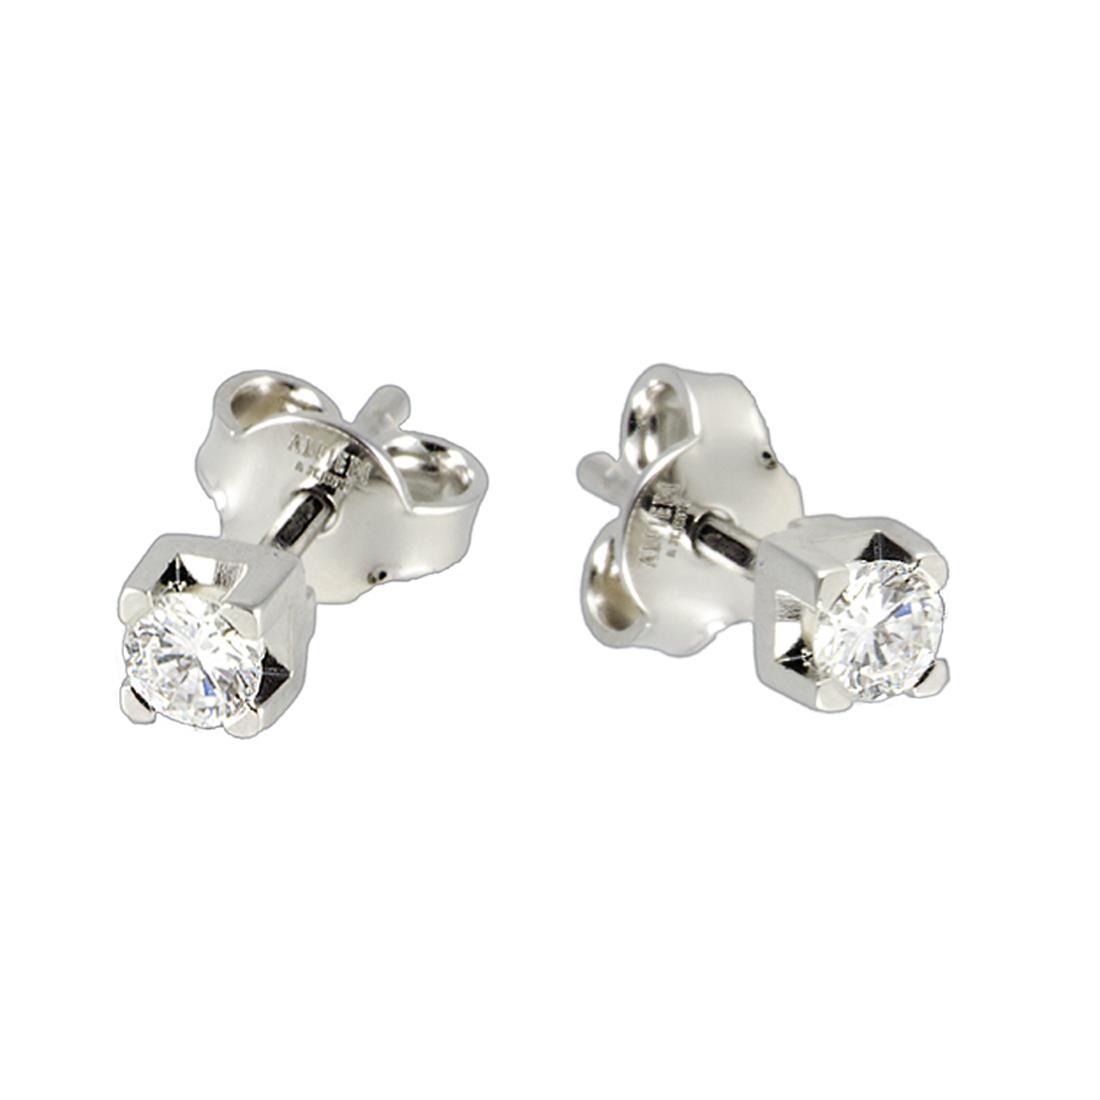 Orecchini Alfieri & St. John in oro bianco e diamanti 1.00 ct - ALFIERI ST JOHN